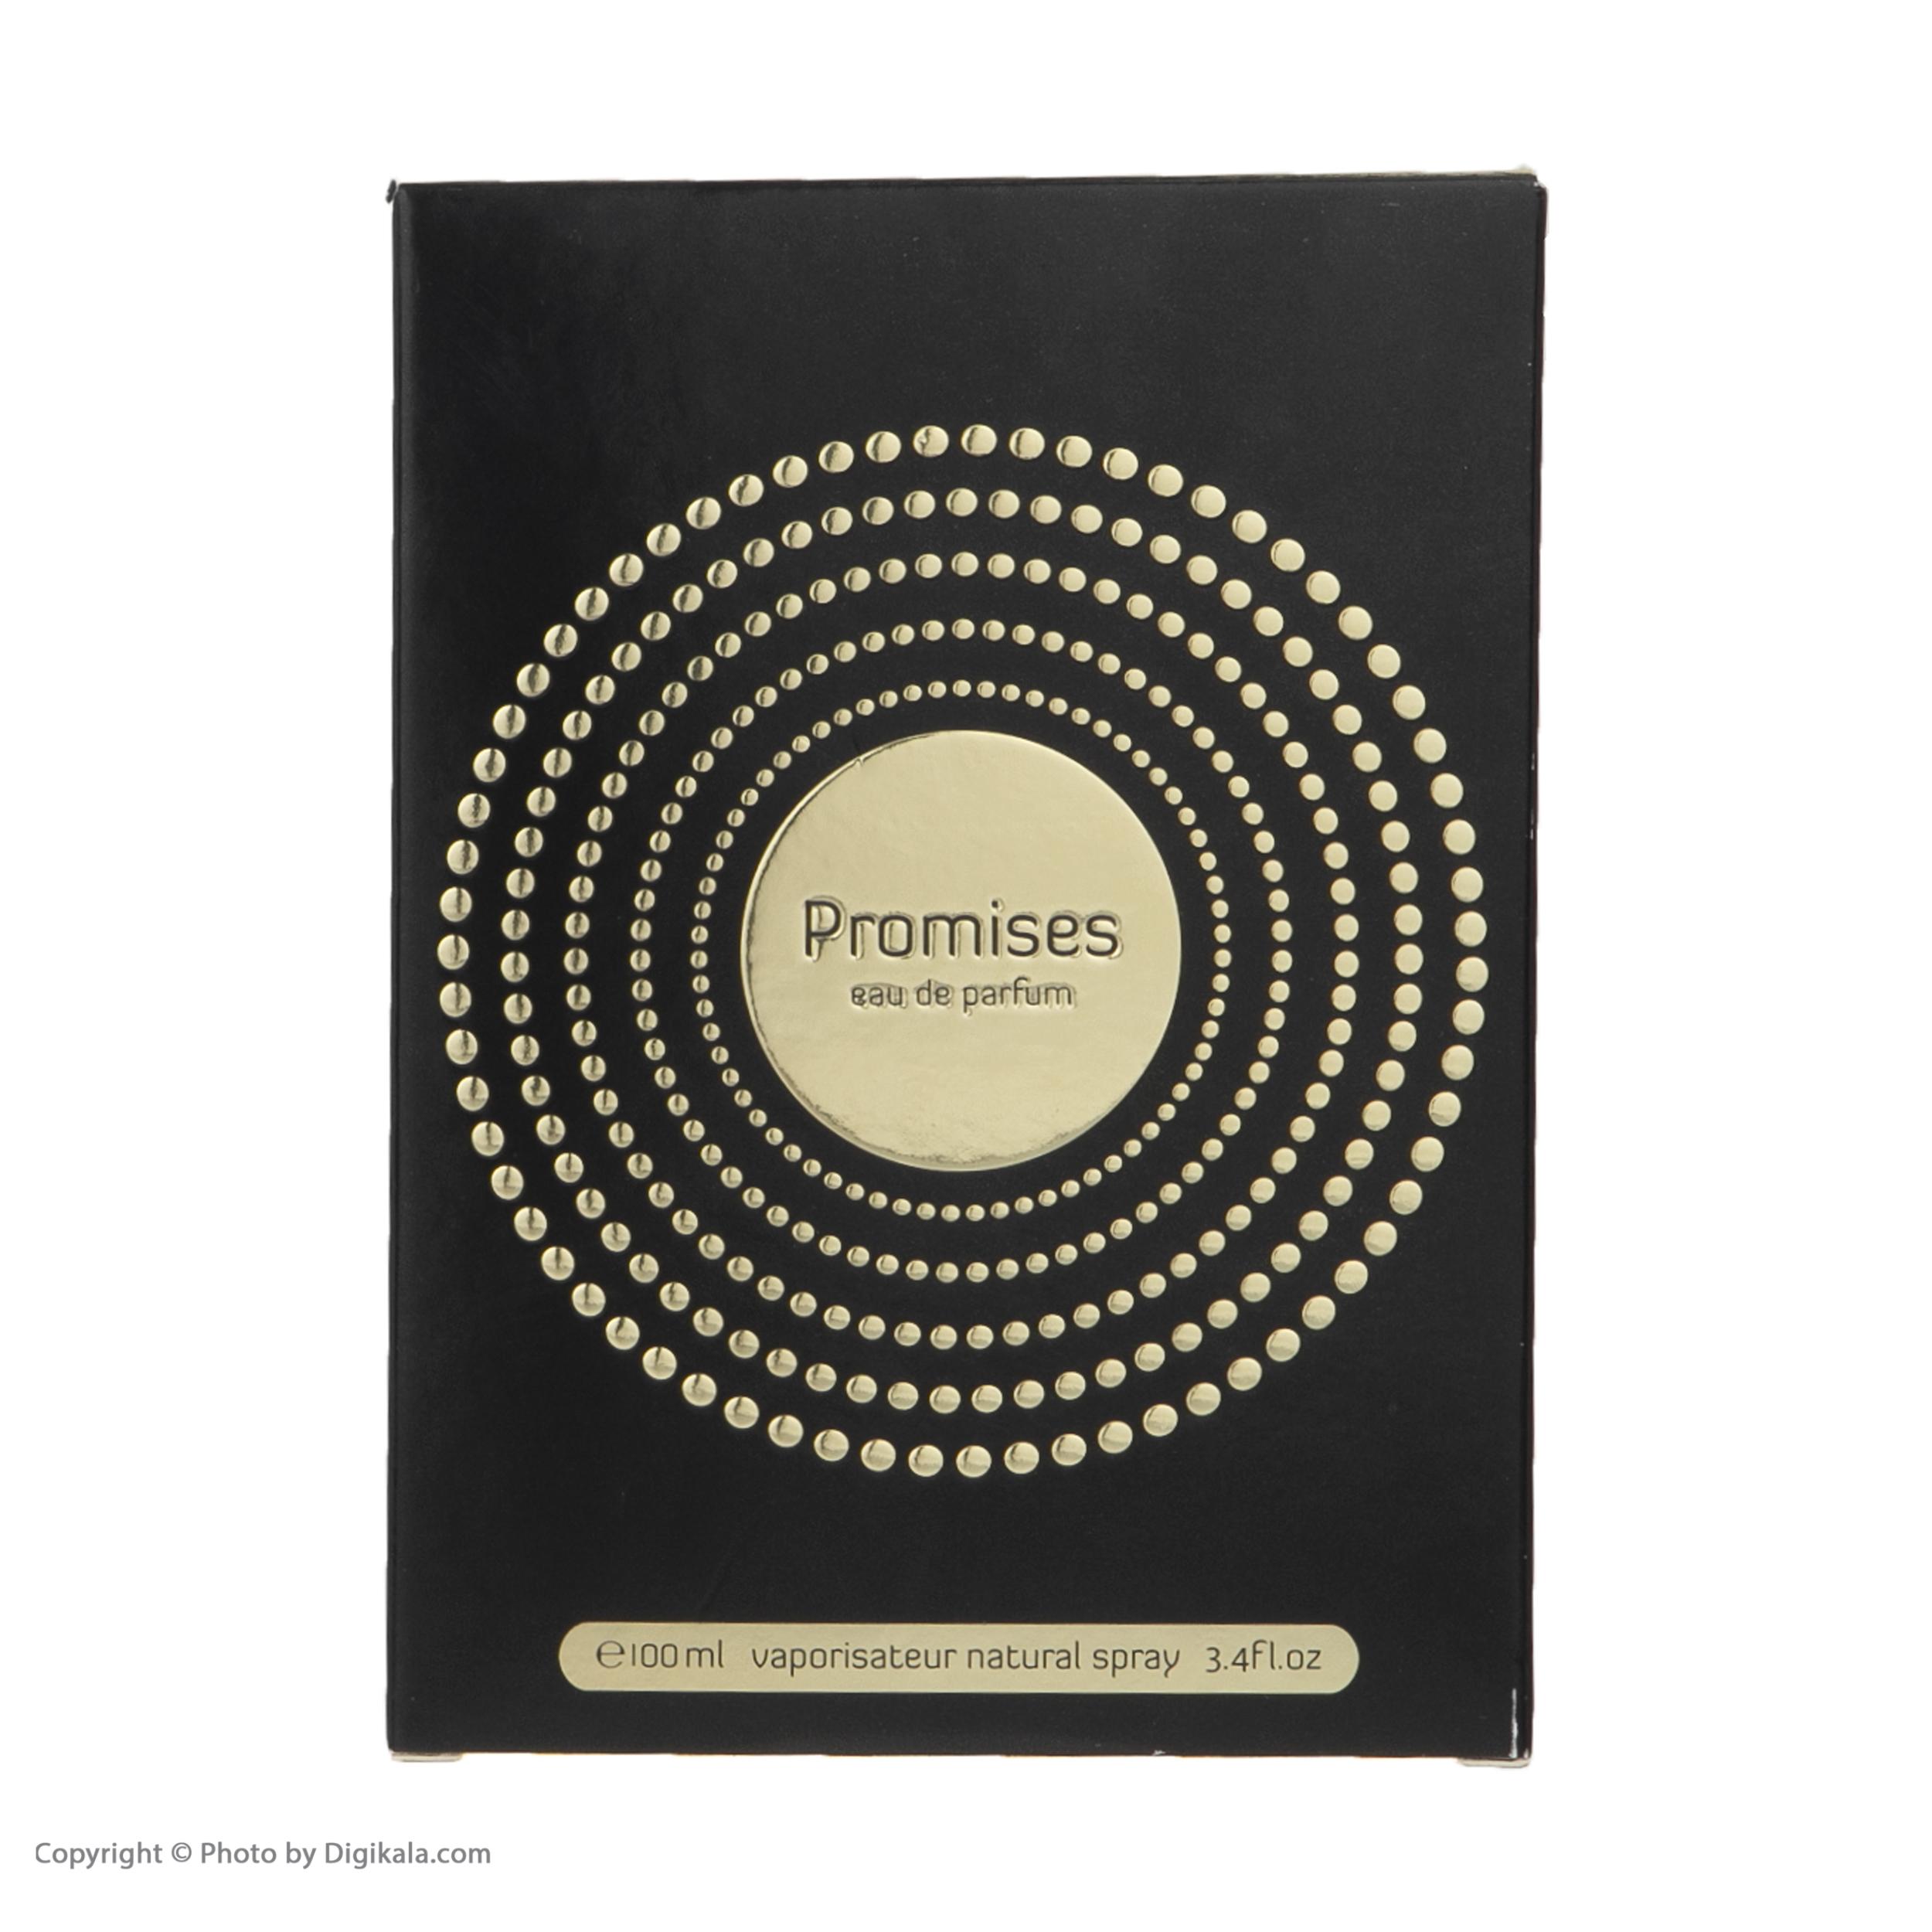 ادو پرفیوم زنانه امپر مدل Promises حجم 100 میلی لیتر